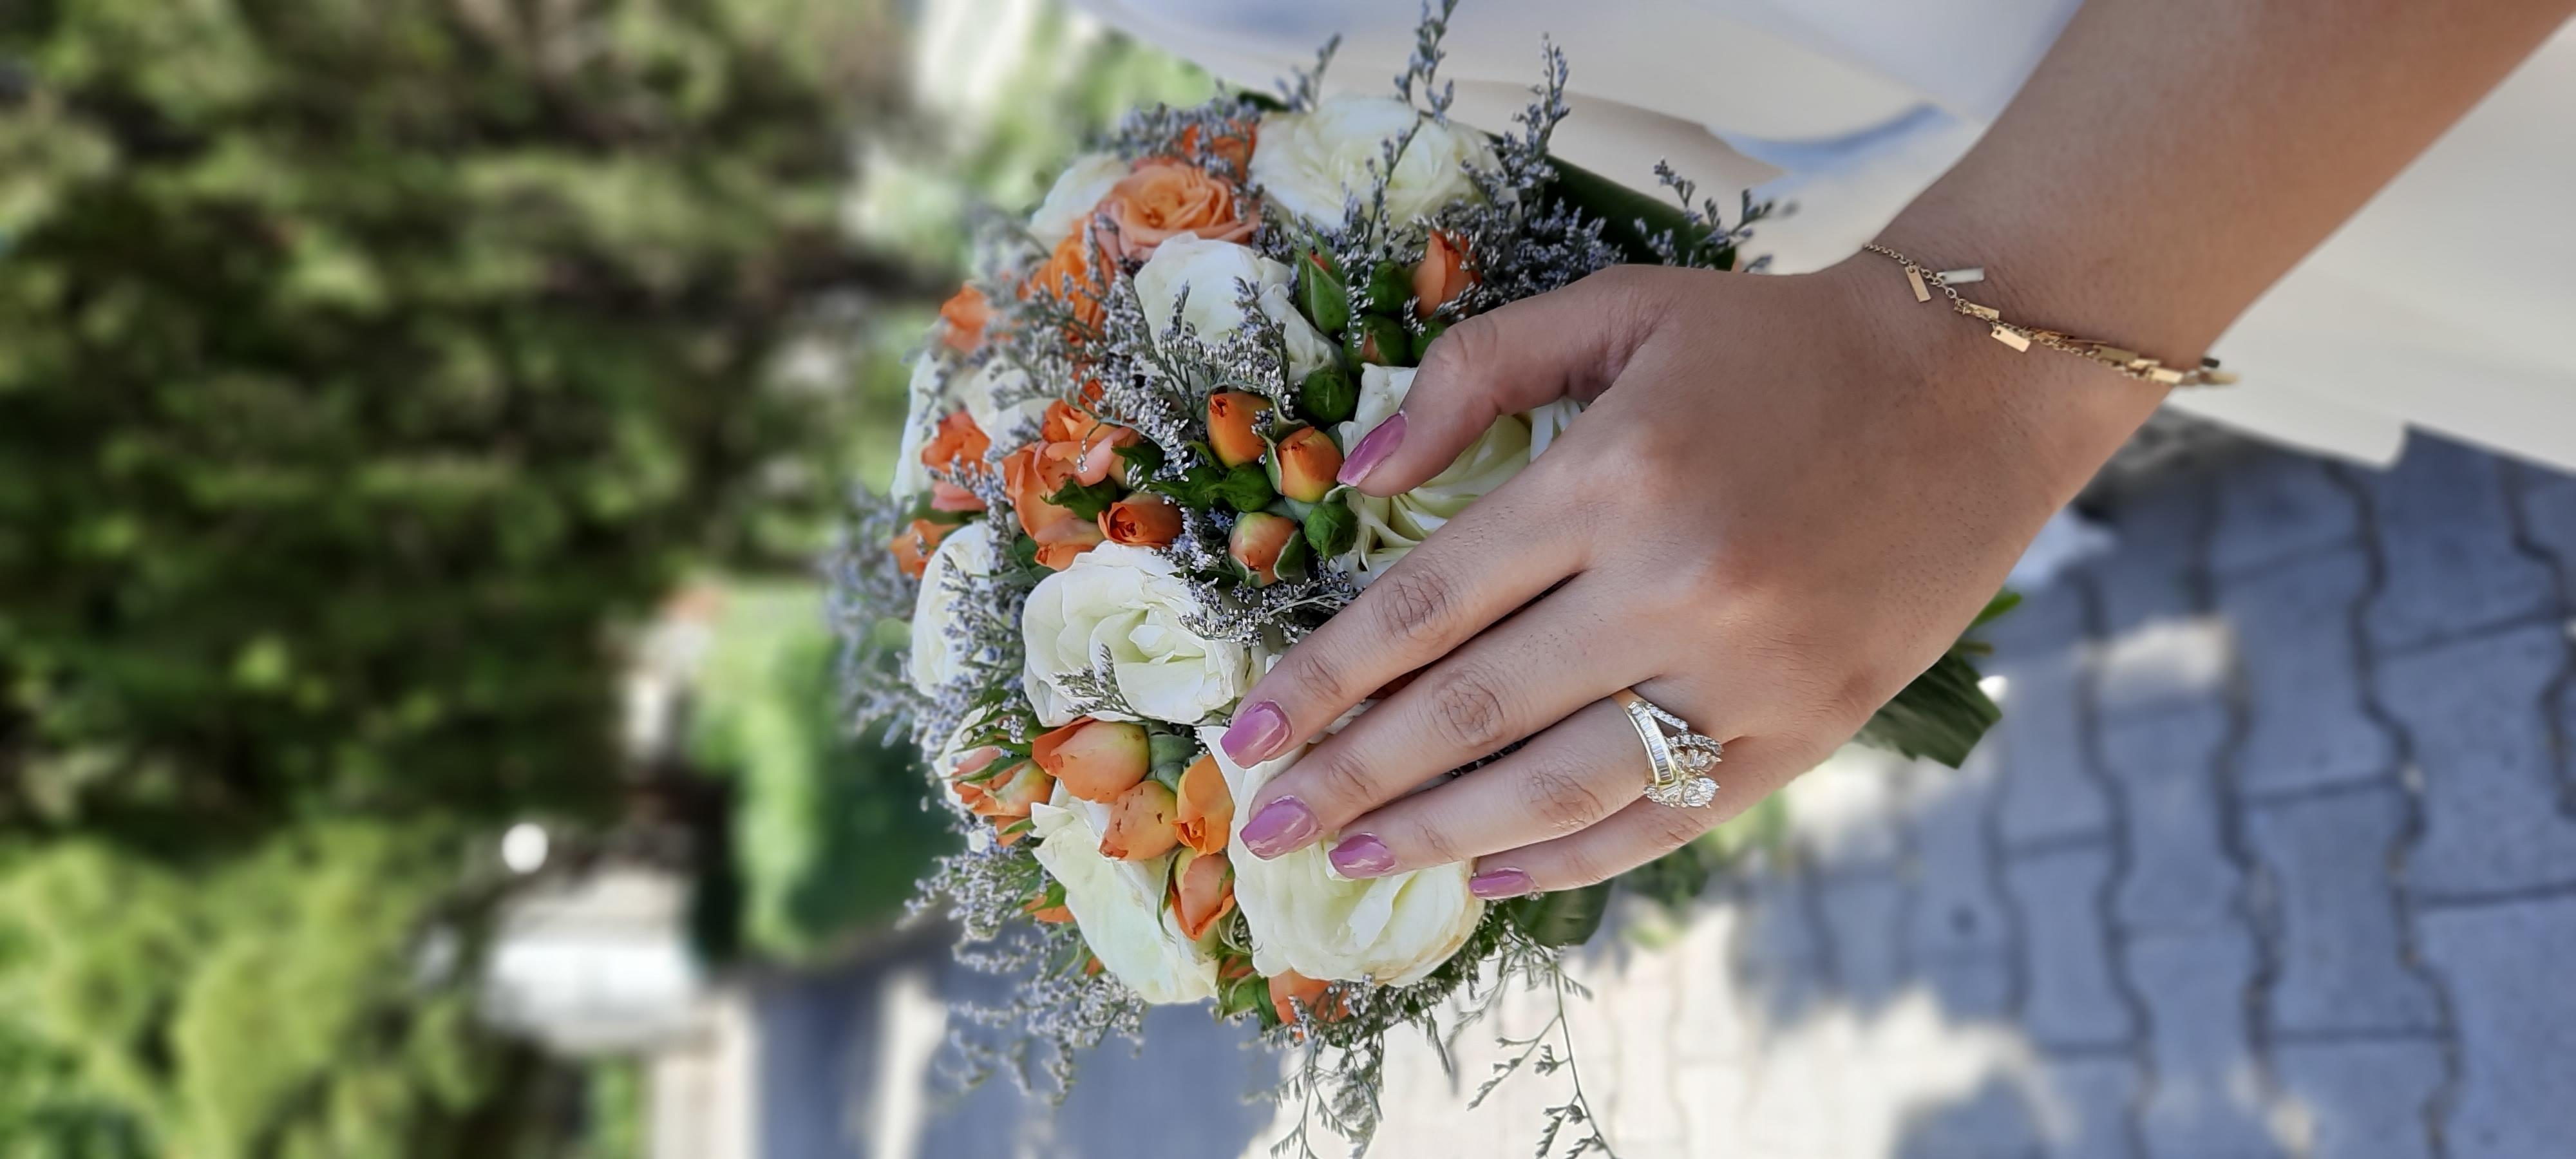 محضر،ازدواج،تشریفات مجلل ارجمند 5